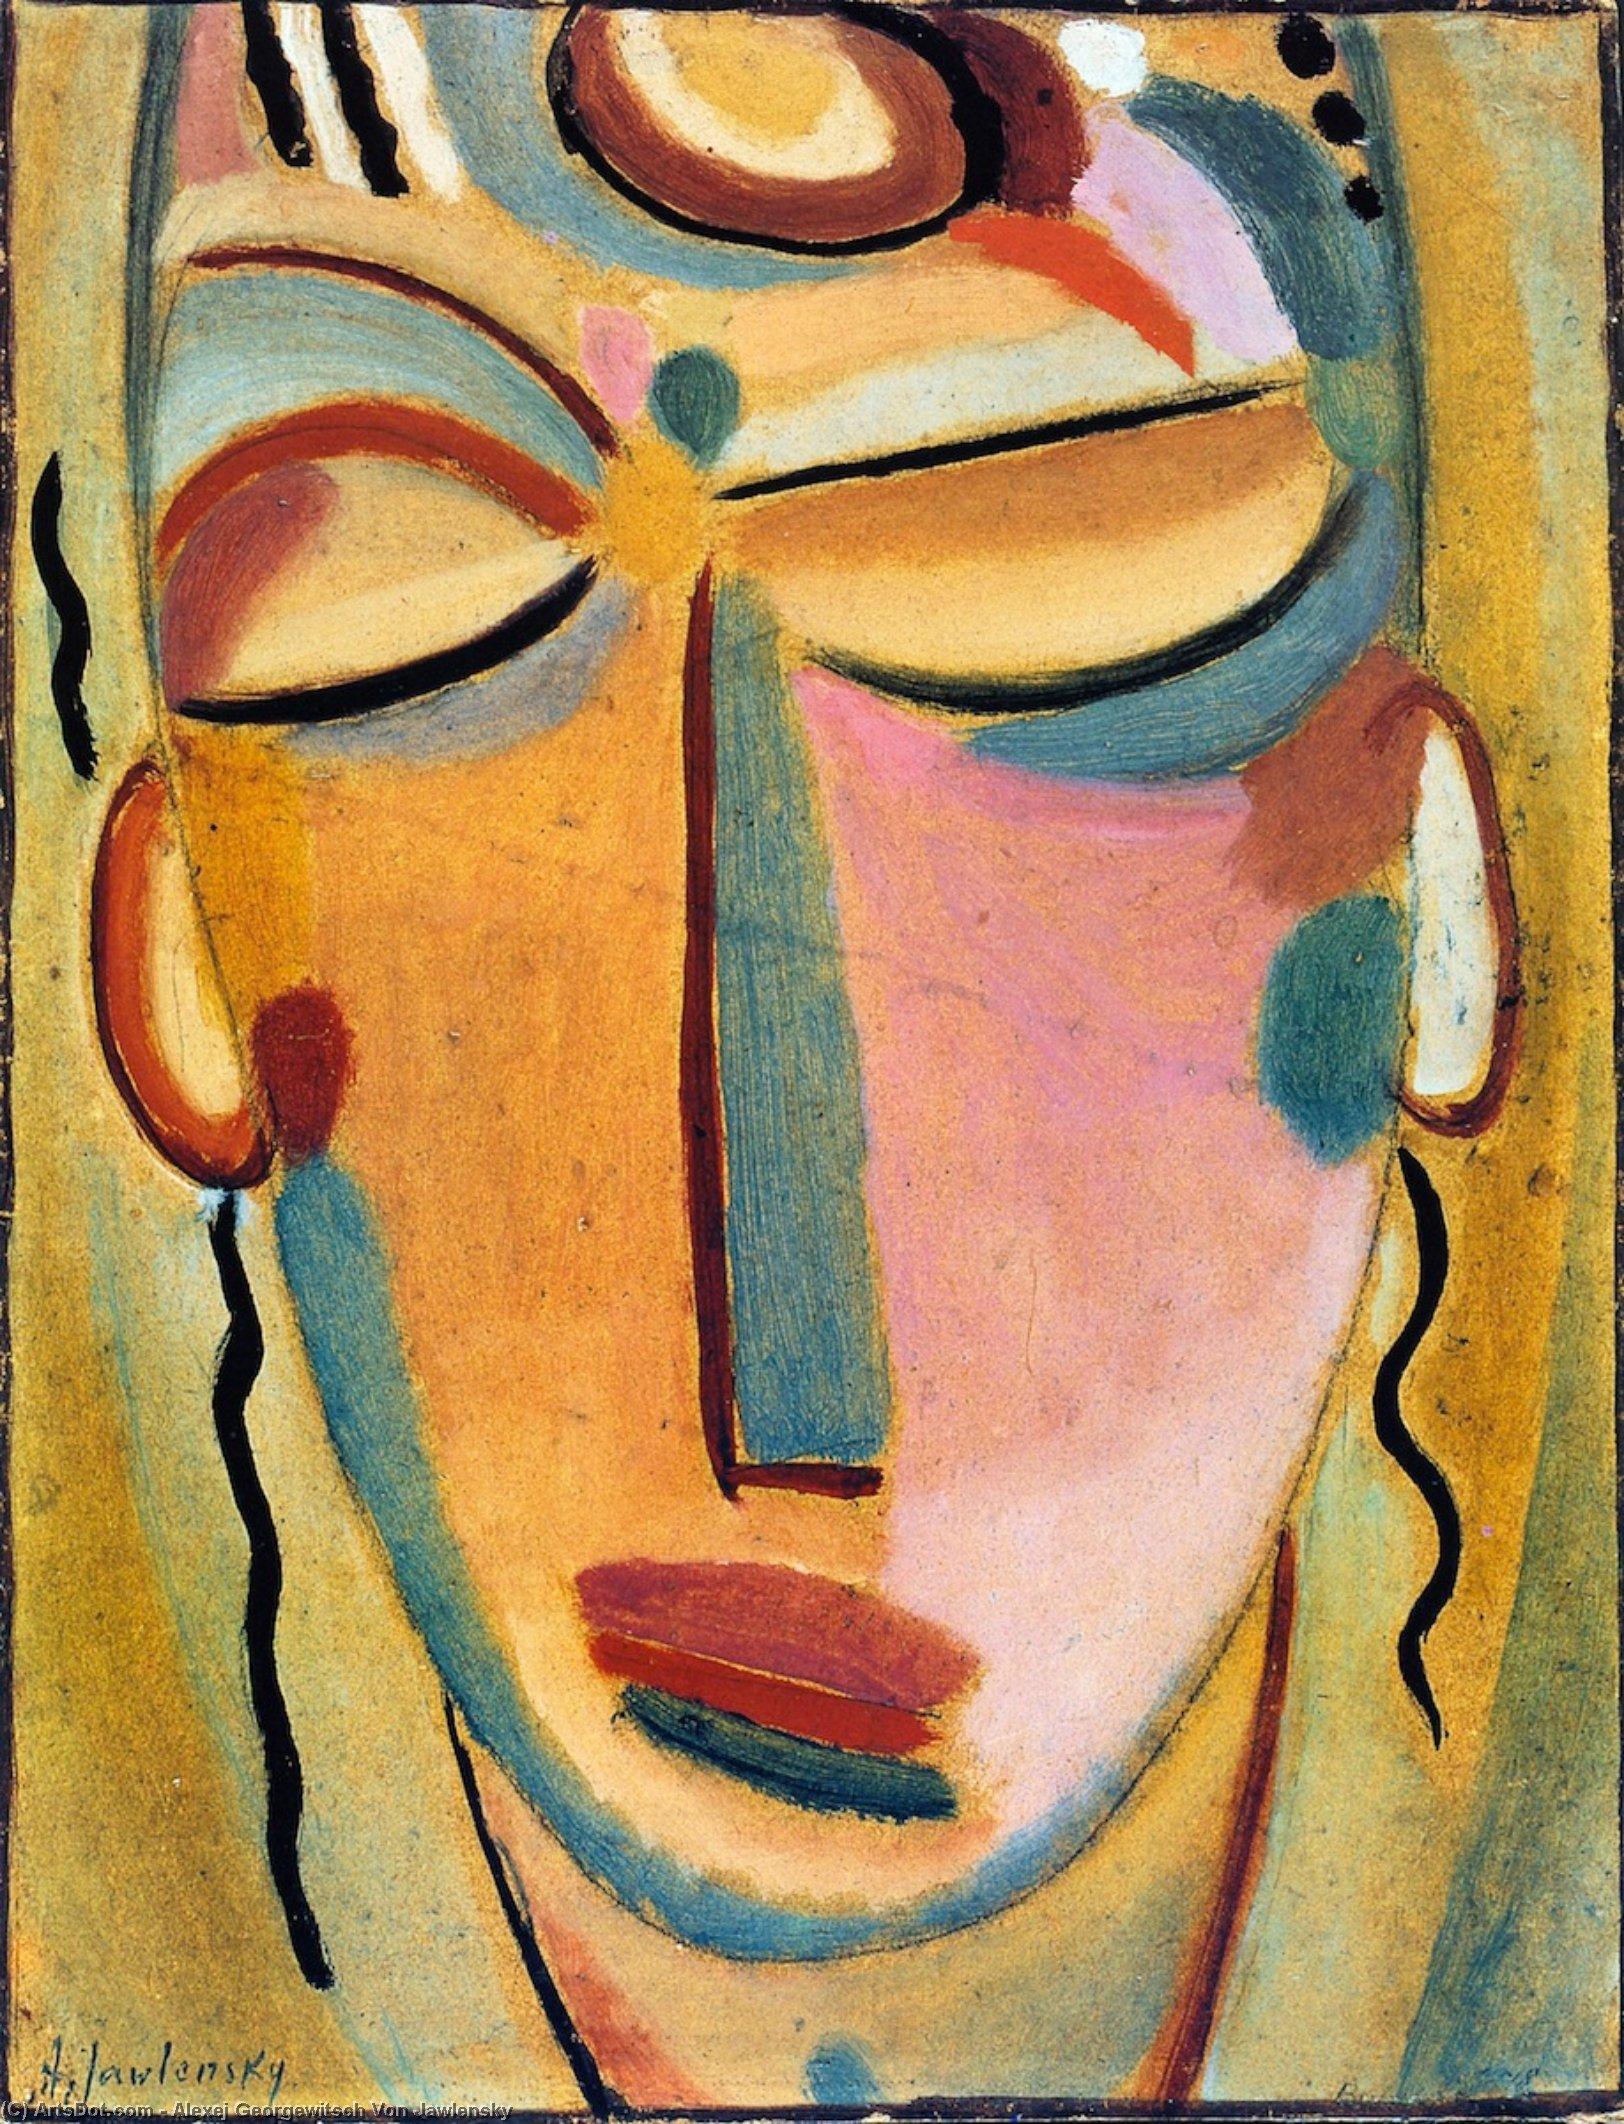 Wikoo.org - موسوعة الفنون الجميلة - اللوحة، العمل الفني Alexej Georgewitsch Von Jawlensky - Mystical Head: Meditation